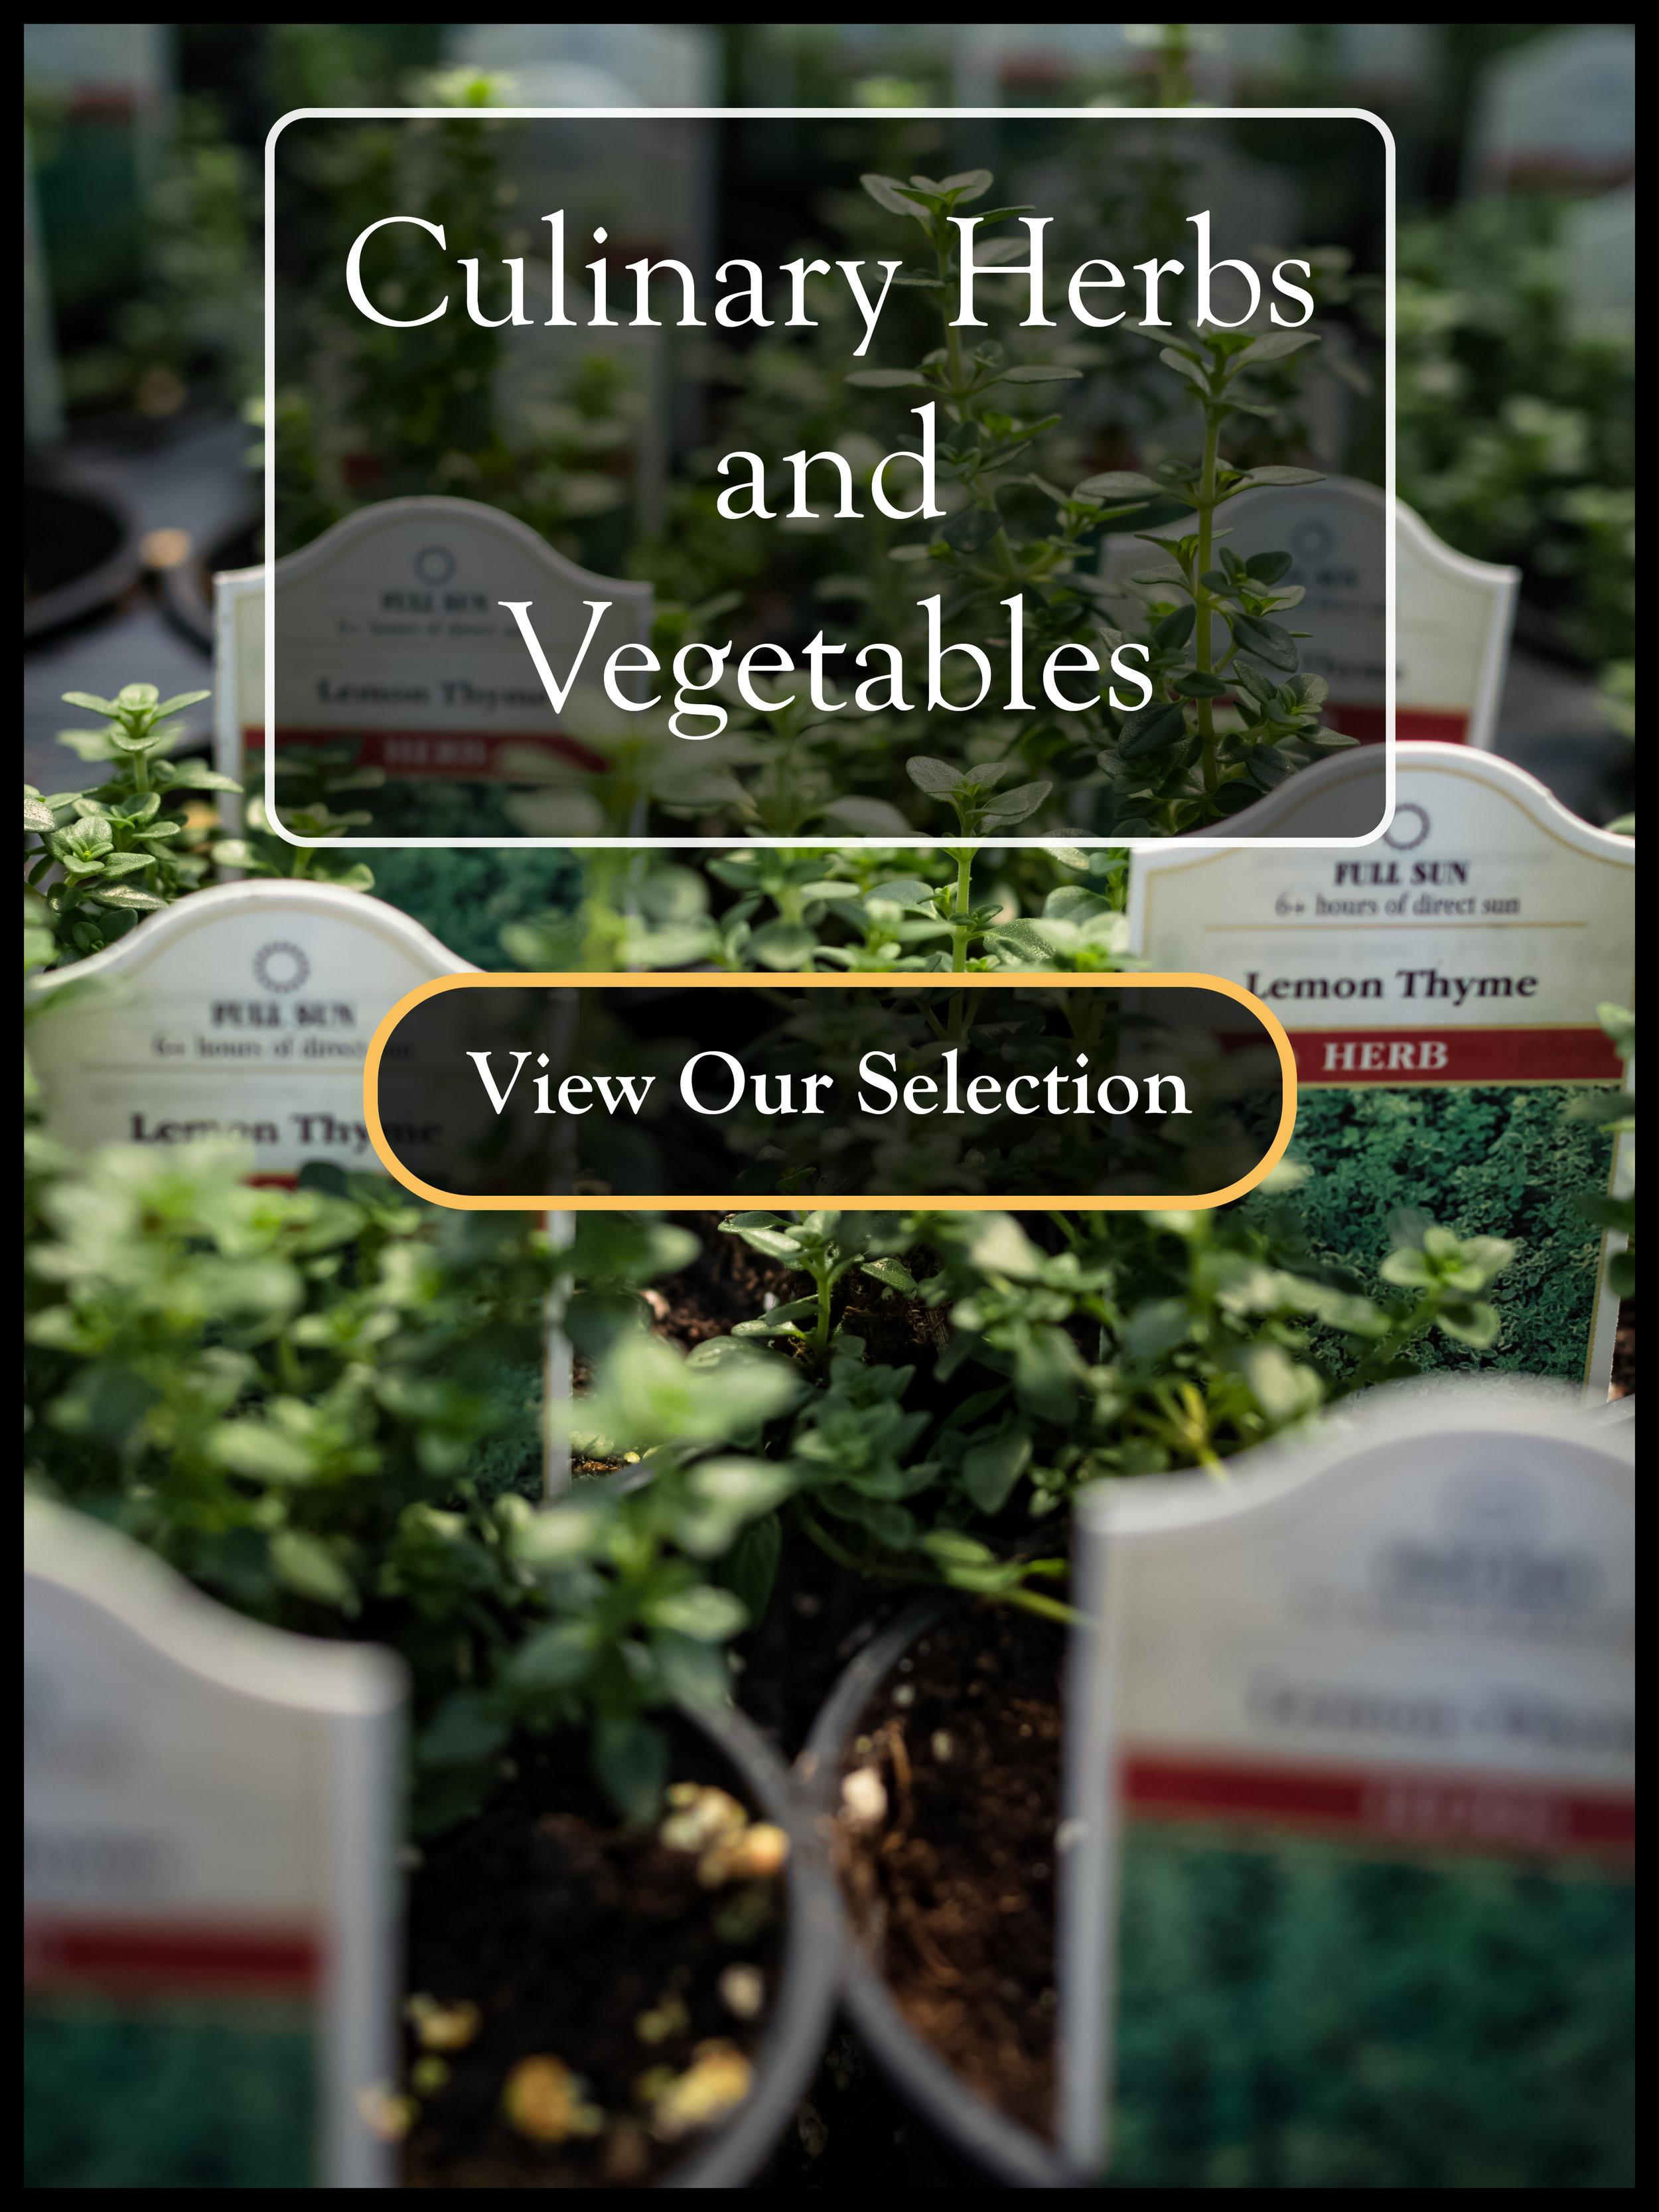 Culinary Plants and Veggies.jpg